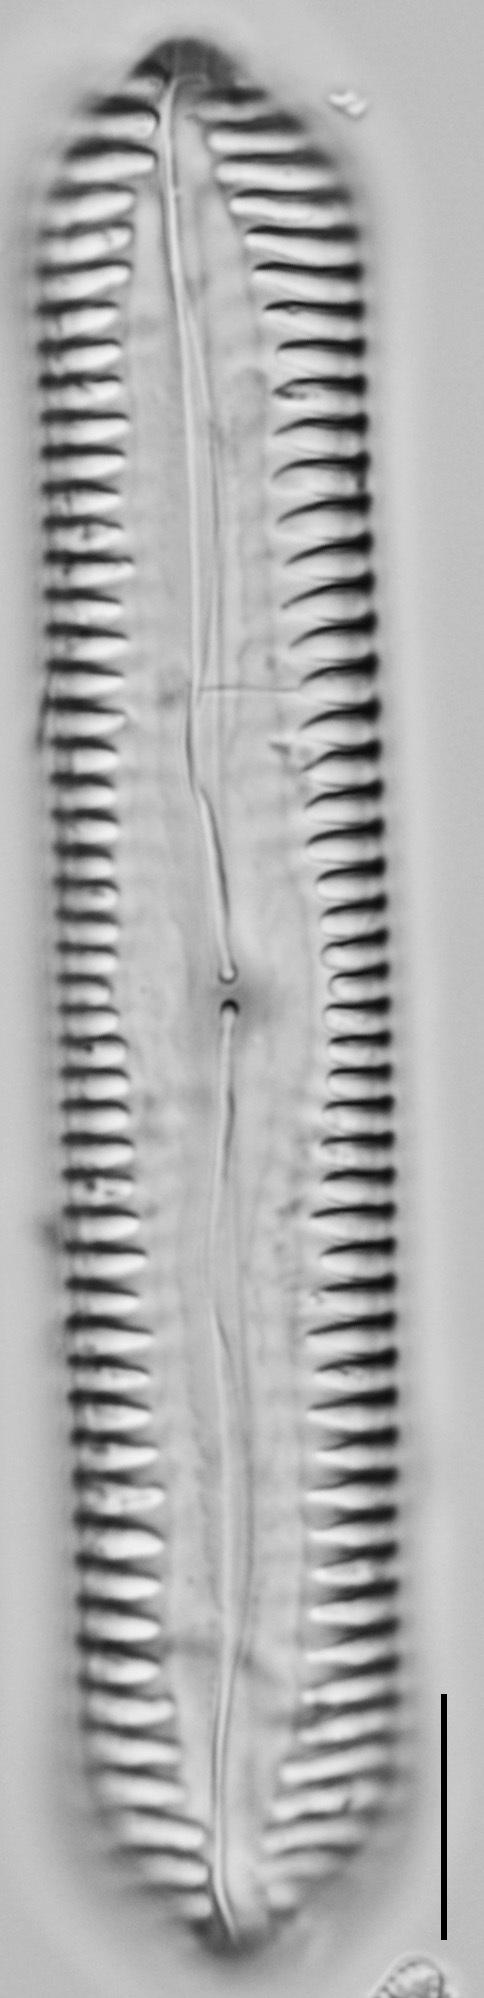 Pinnularia cuneicephala LM2